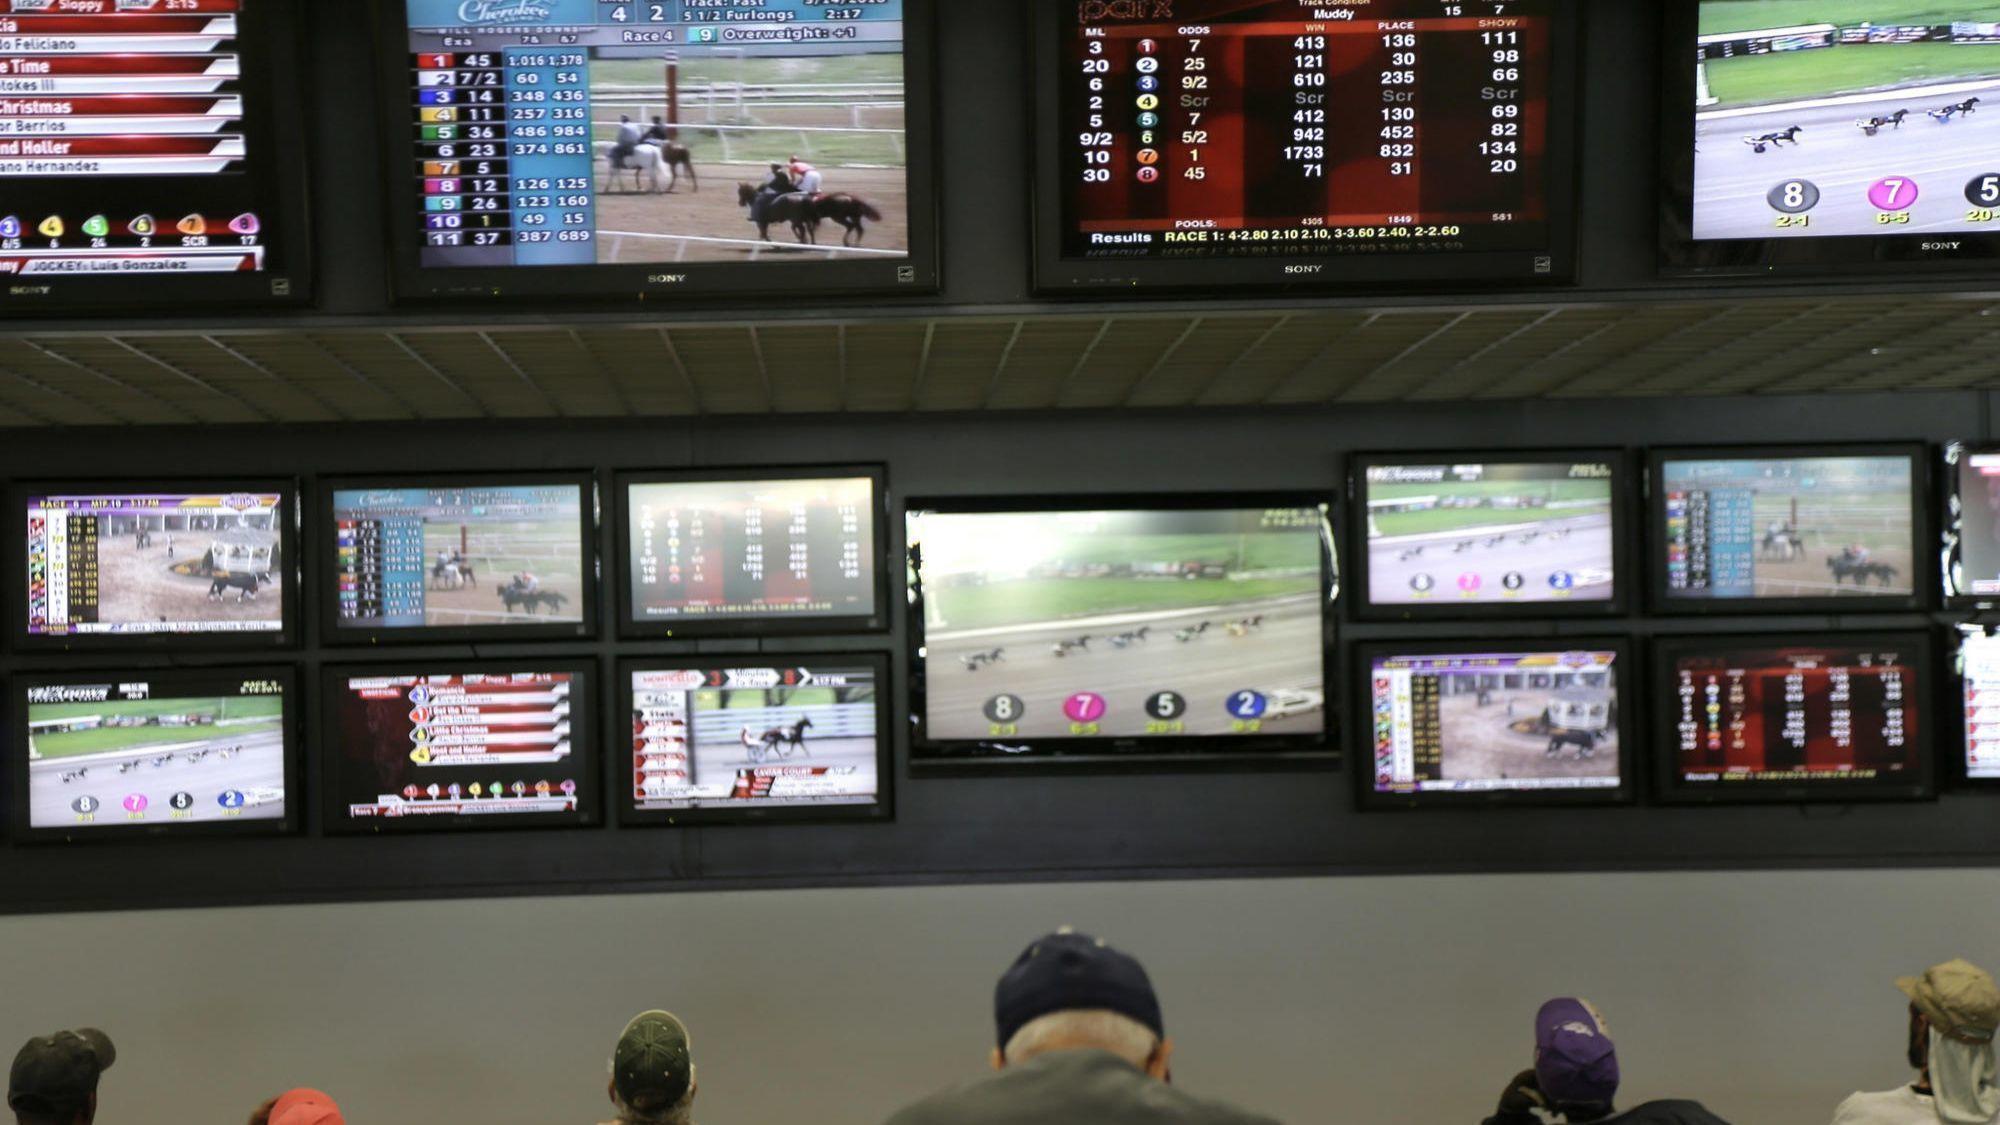 Ct-spt-sports-betting-illinois-integrity-tax-rosenbloom-20180517